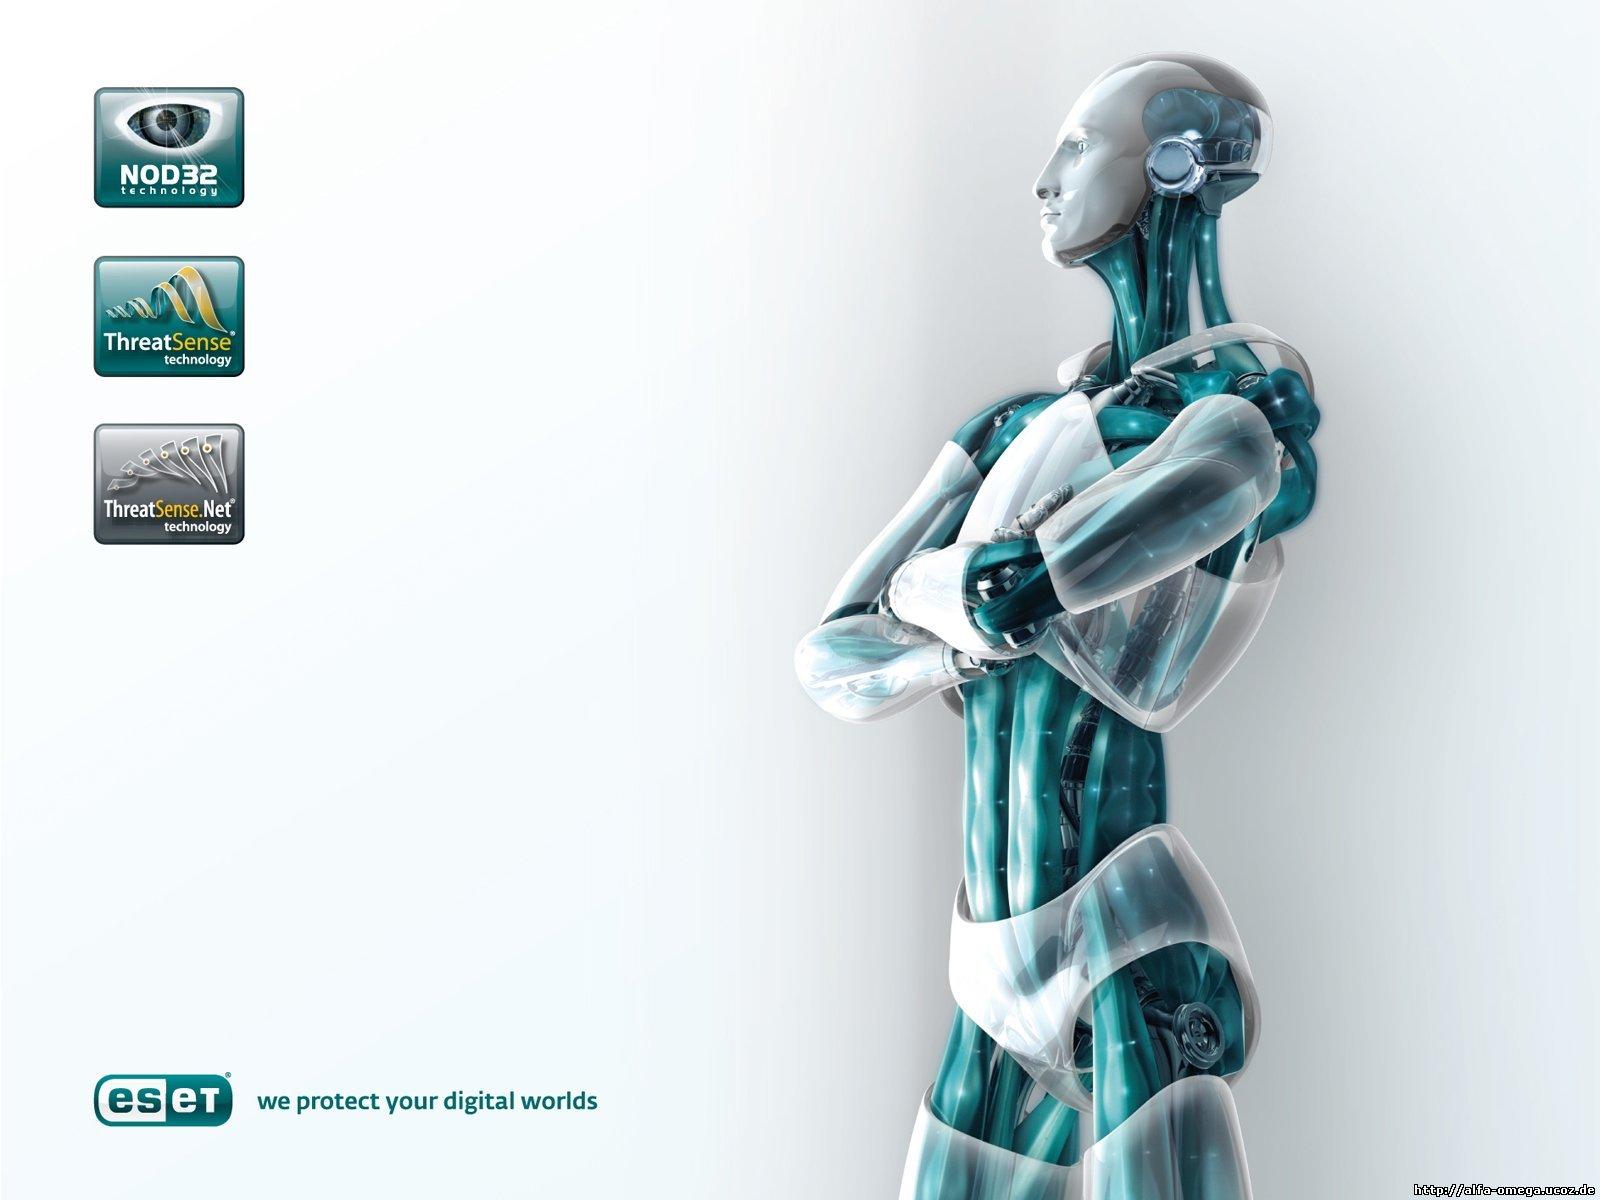 Ключ от журнала CHIP 7 для ESET NOD32 Antivirus До 10 августа 2012г